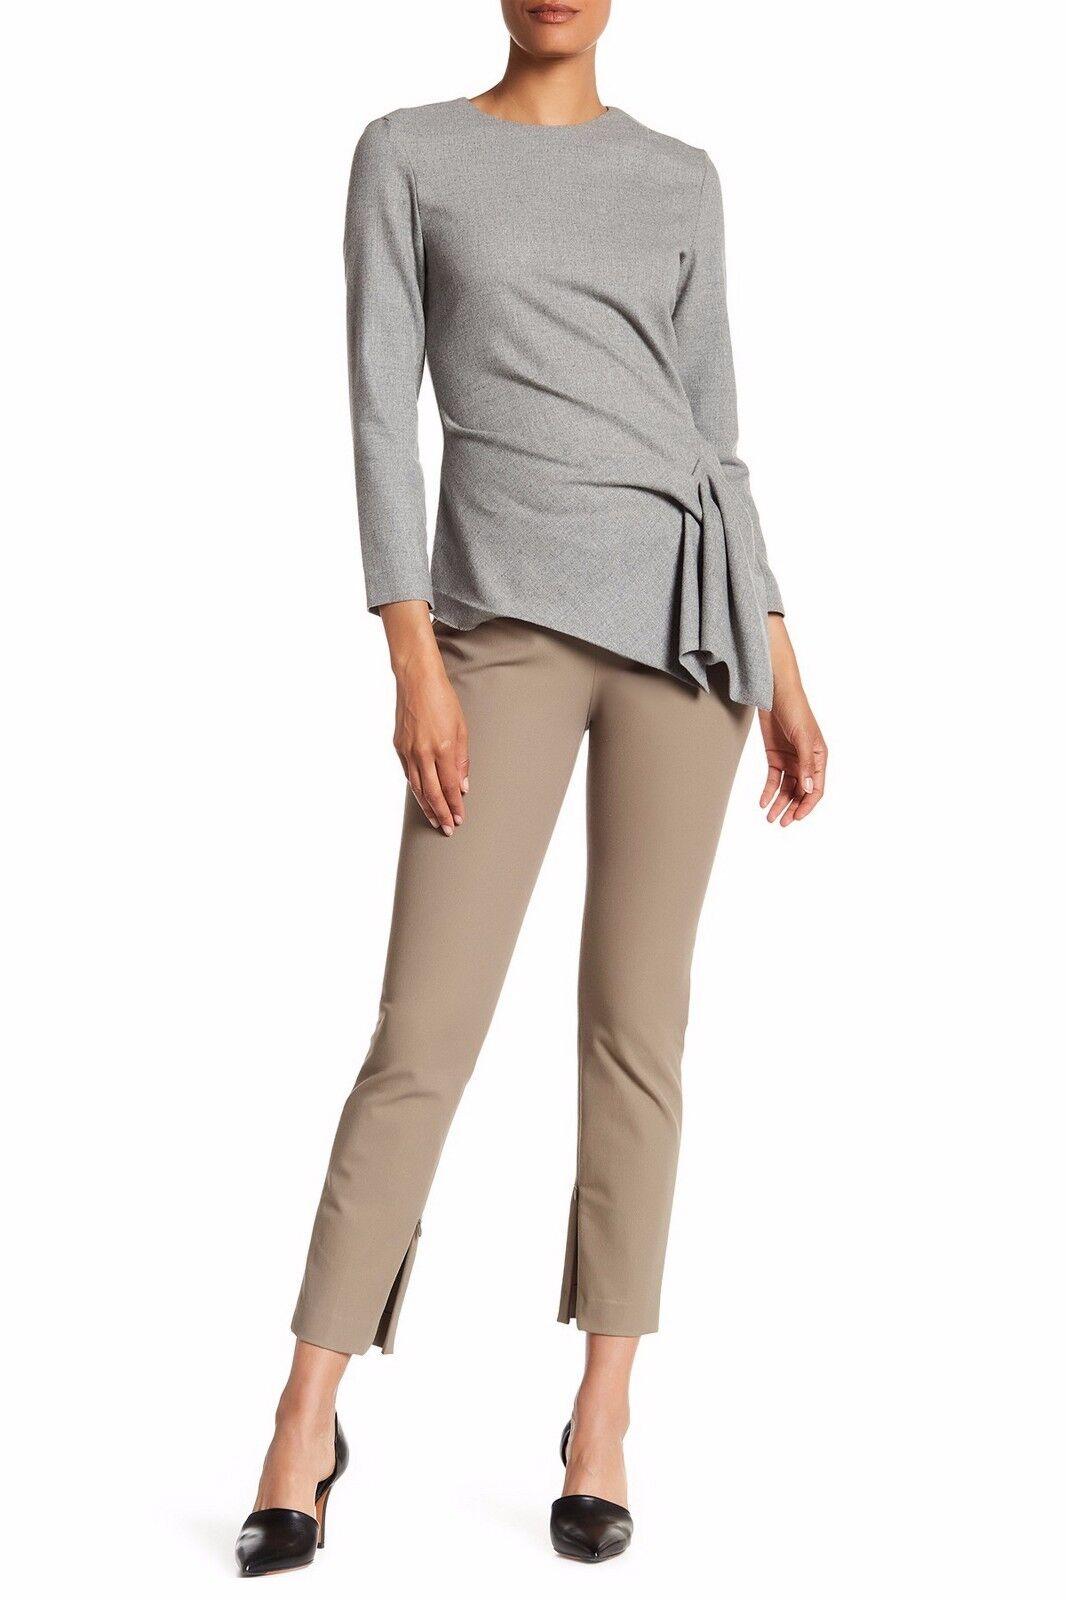 NEW TheoryAlettah NP Jetty Slim Pants,KHAKI, SIZE 8,  265 retail